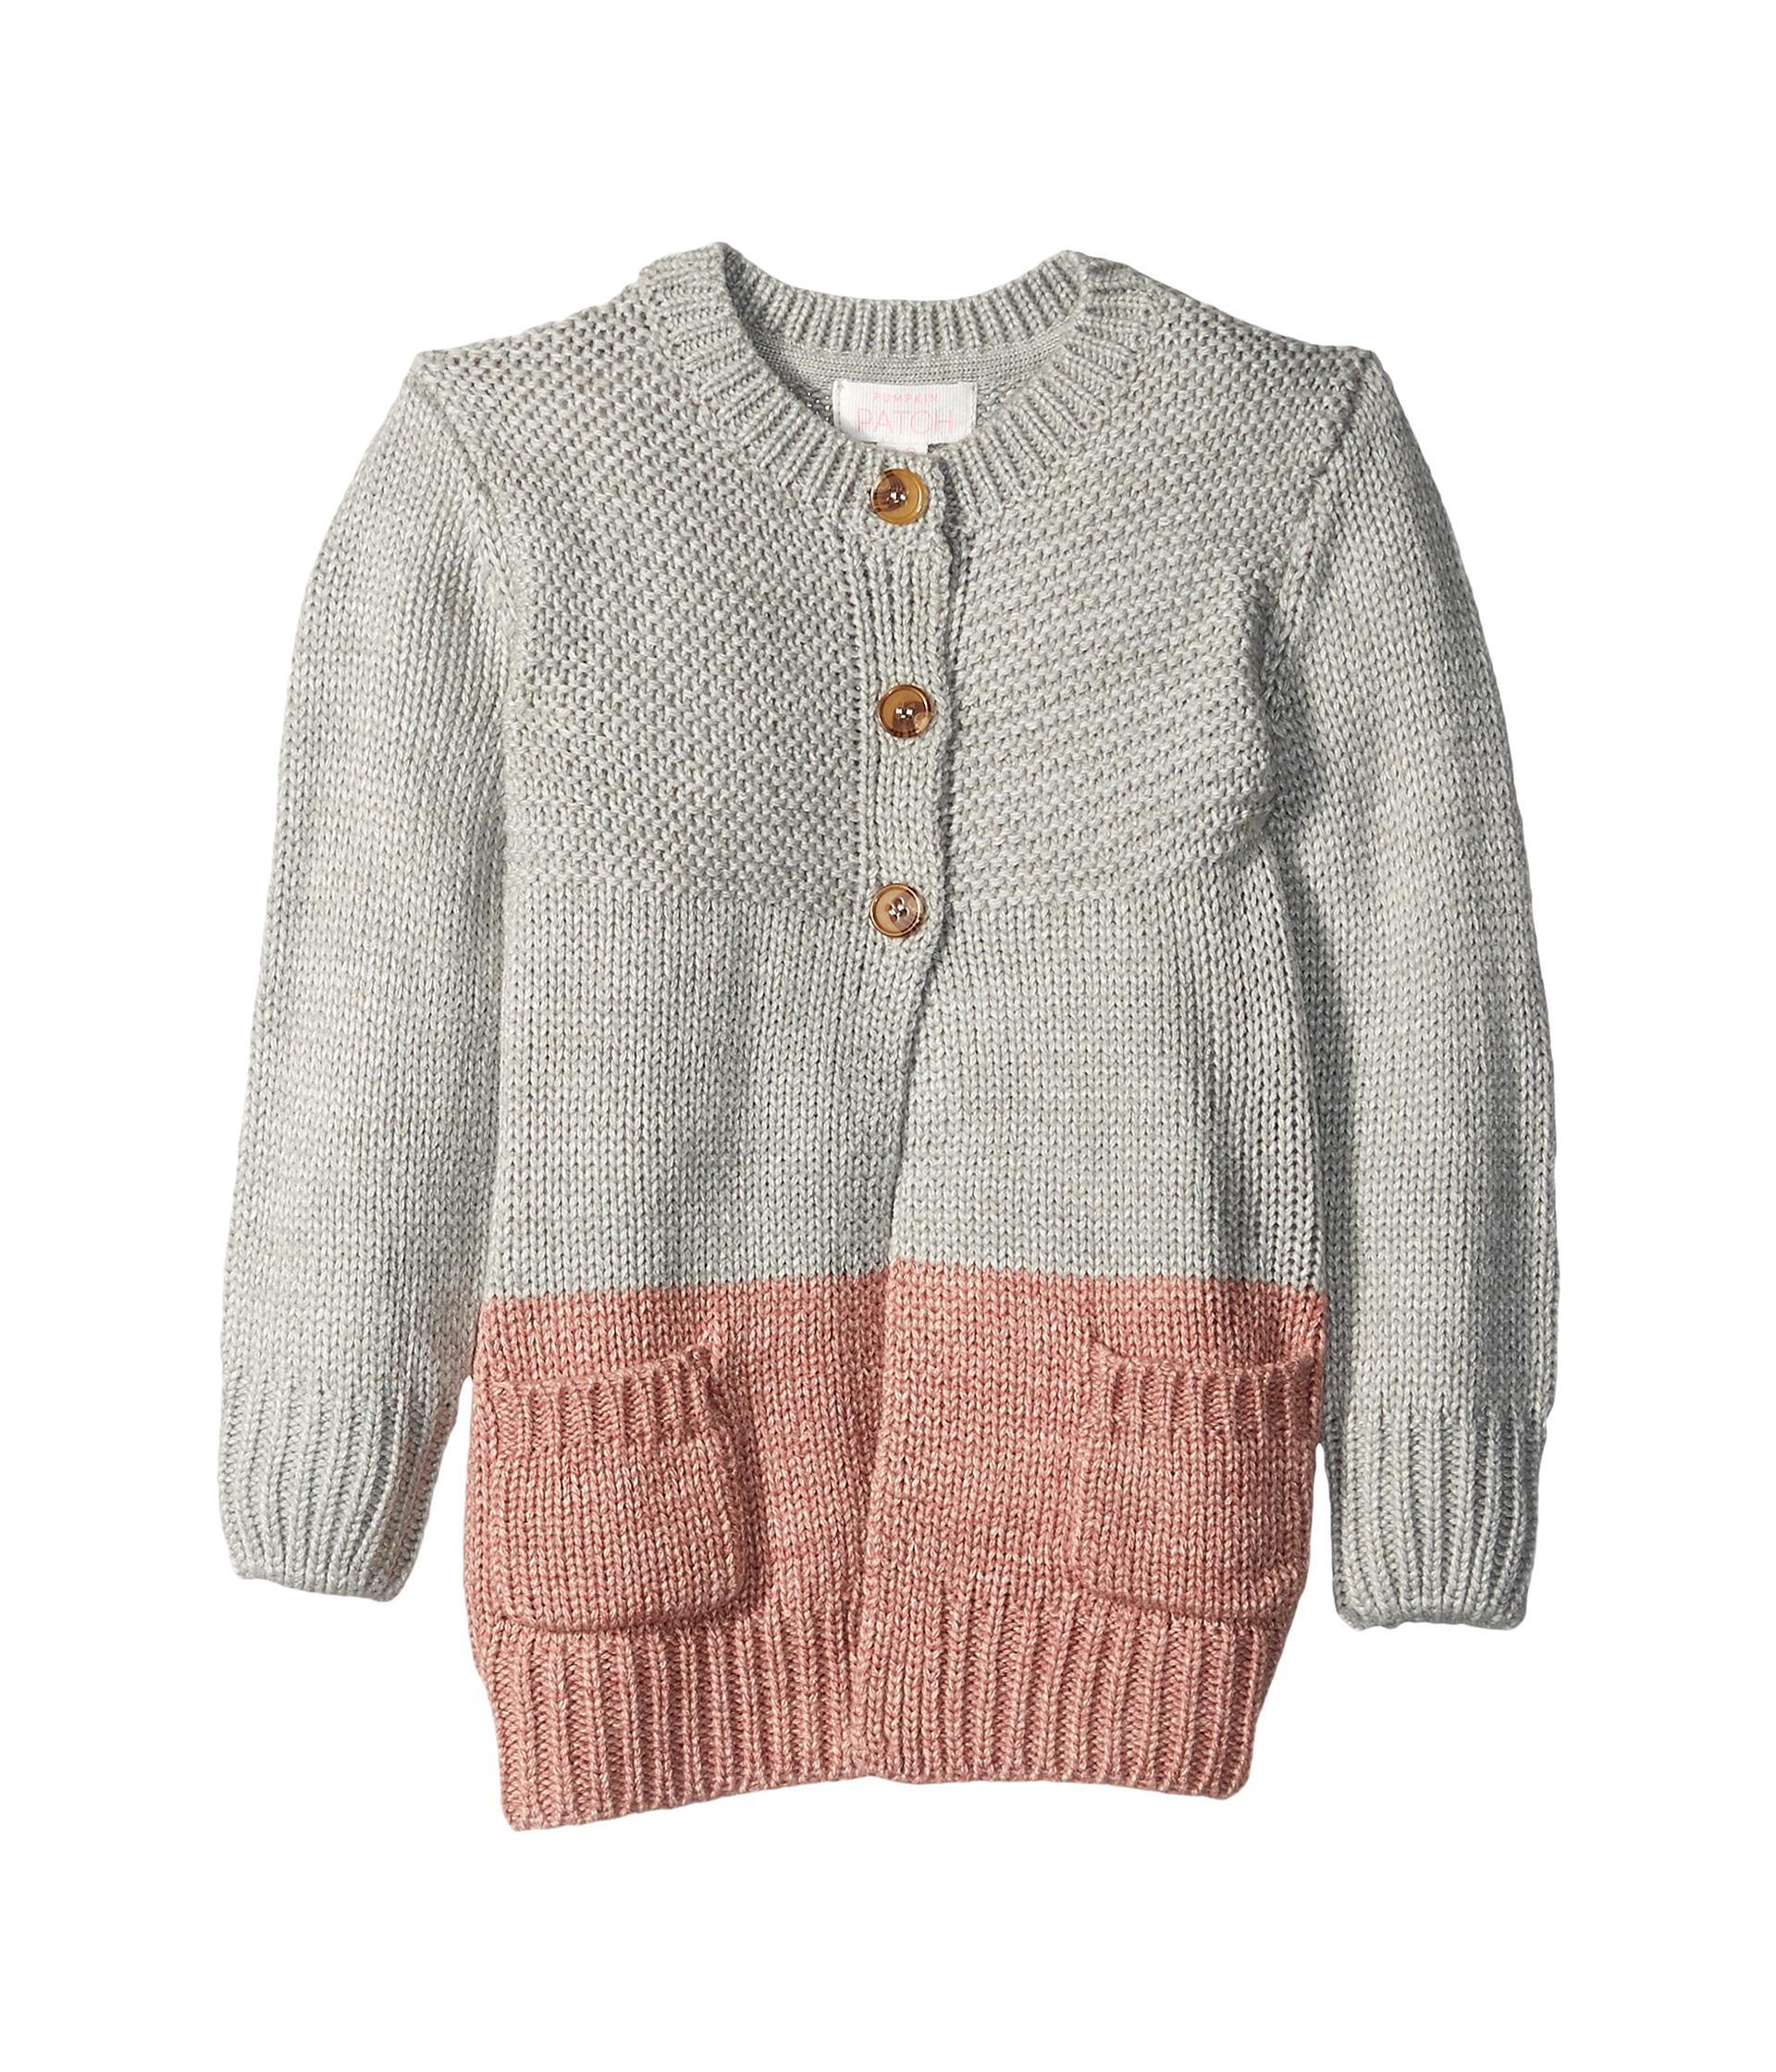 Chunky Knit Cardigan Pattern For Children : Pumpkin Patch Kids Chunky Knit Long Cardigan (Infant/Toddler/Little Kids/Big ...